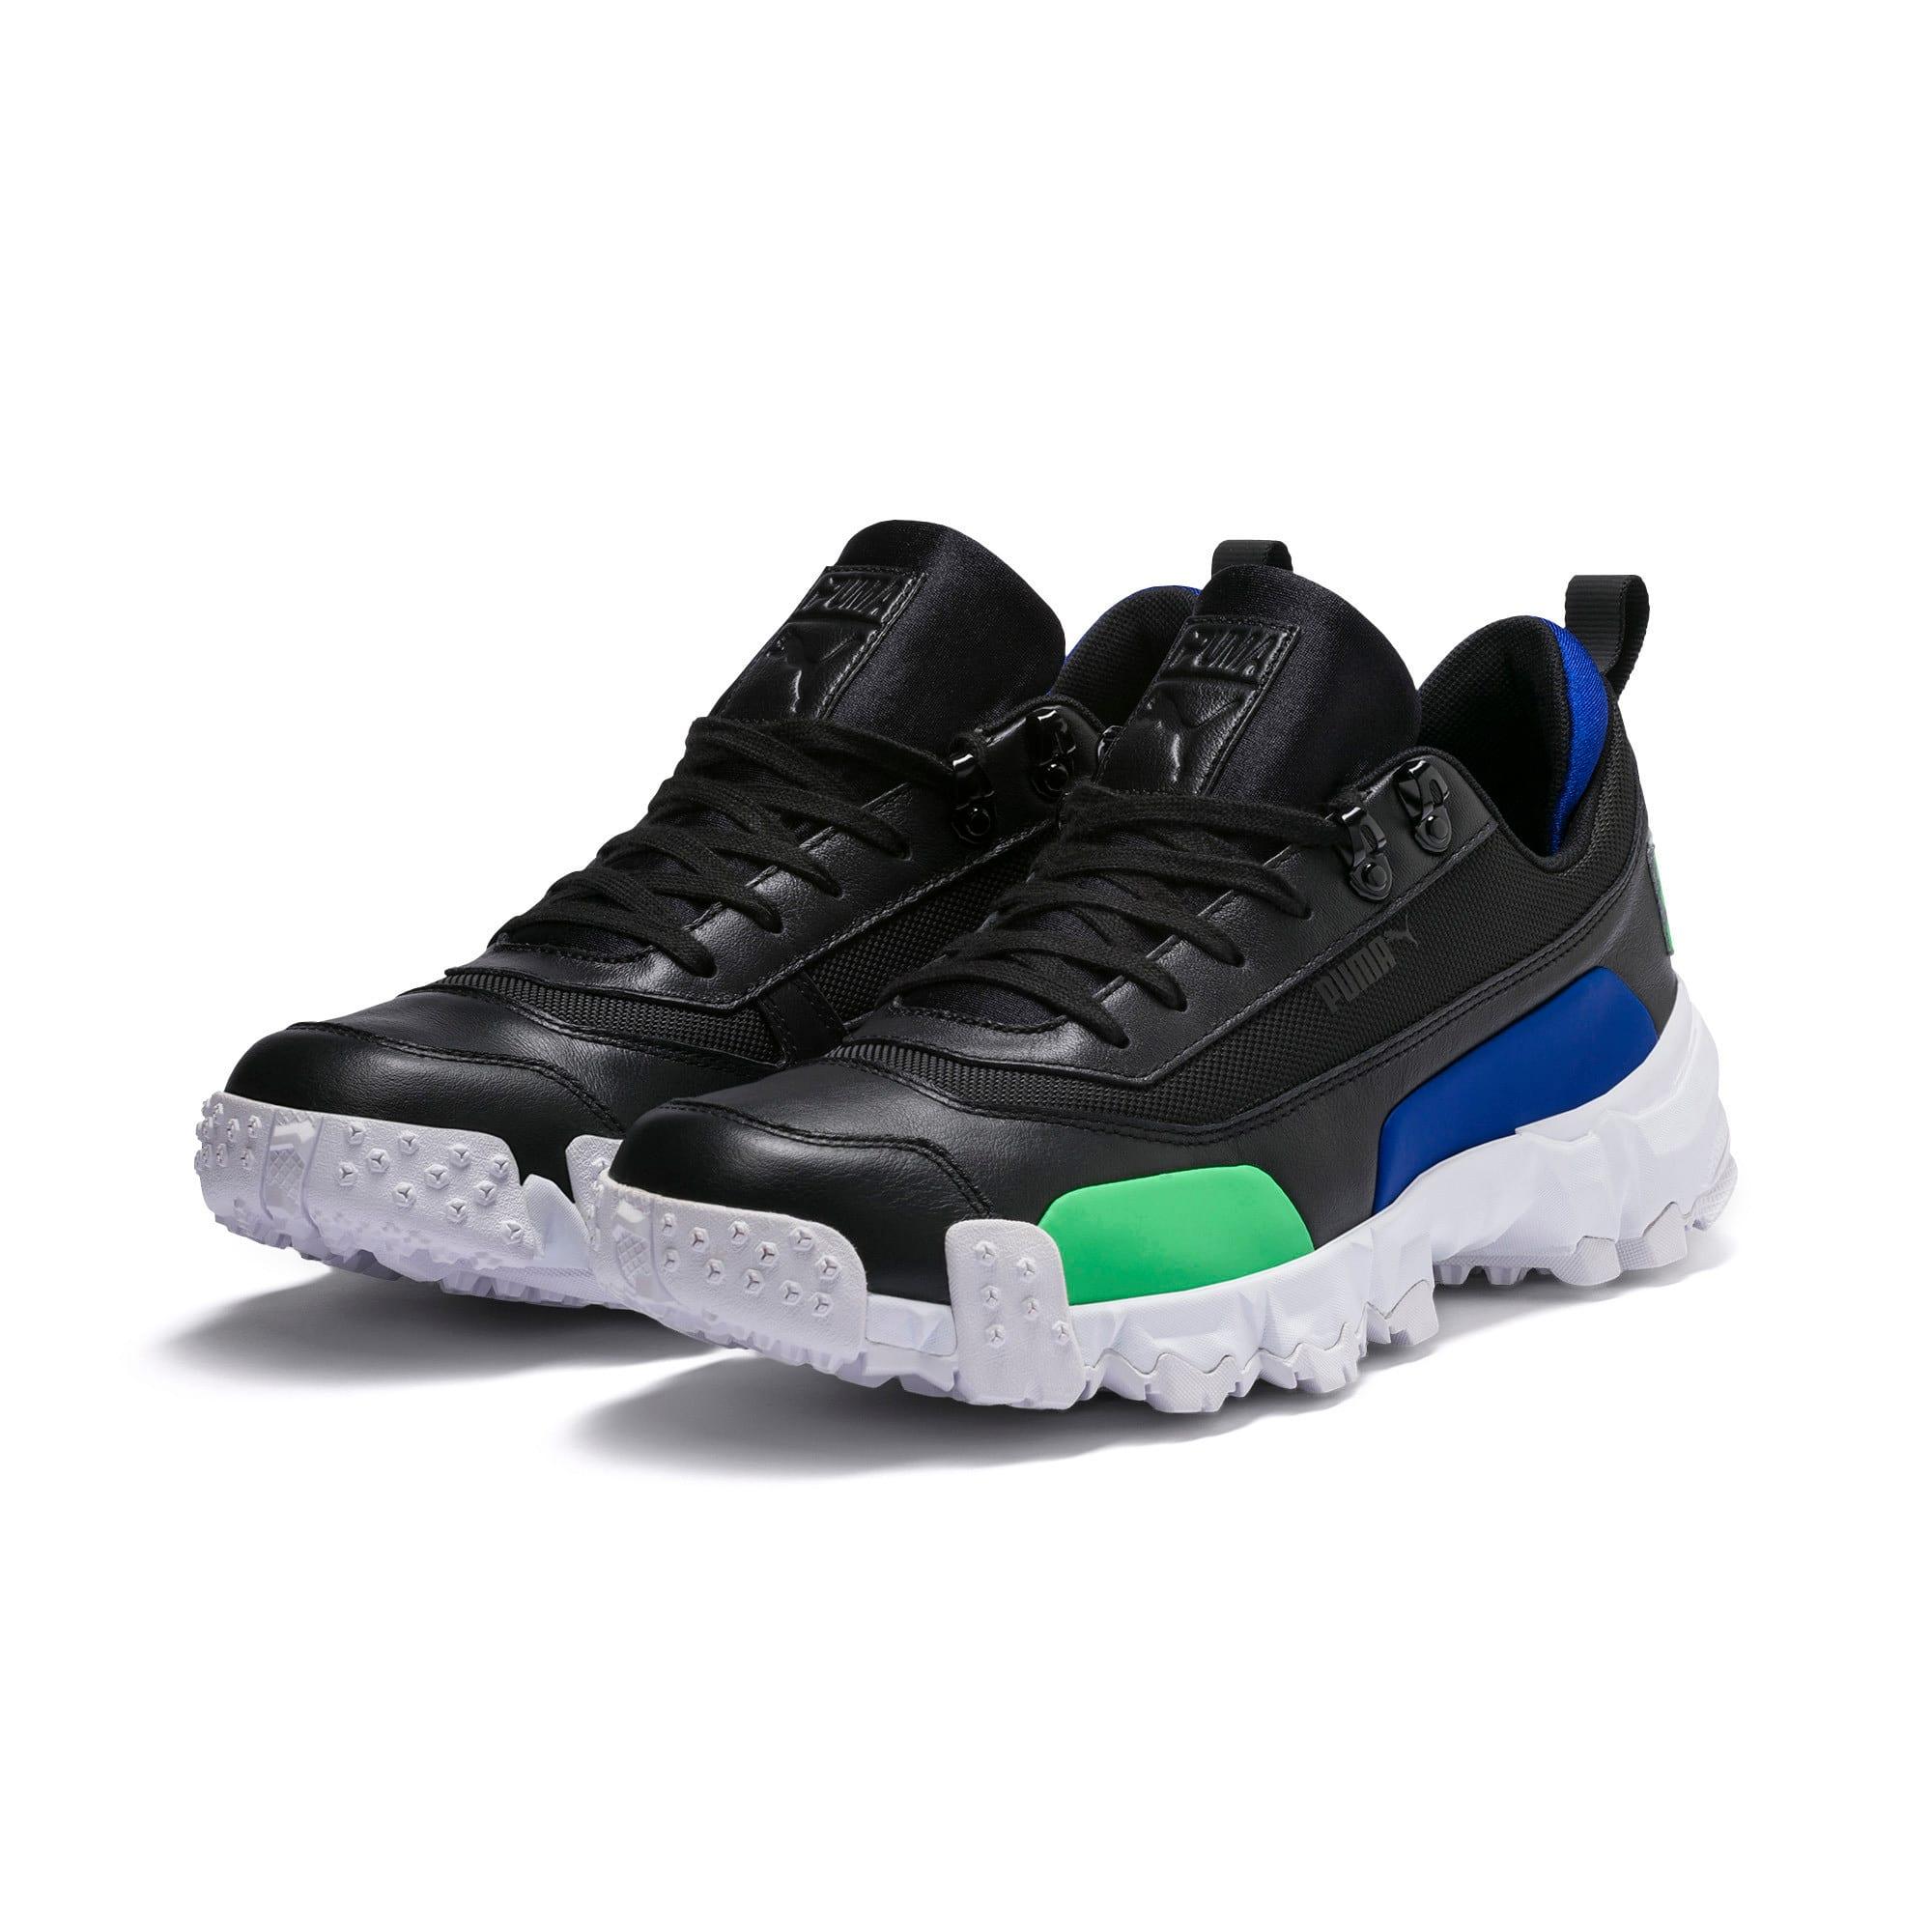 Thumbnail 3 of Trailfox Leather Sneakers, Puma Black-Irish Green, medium